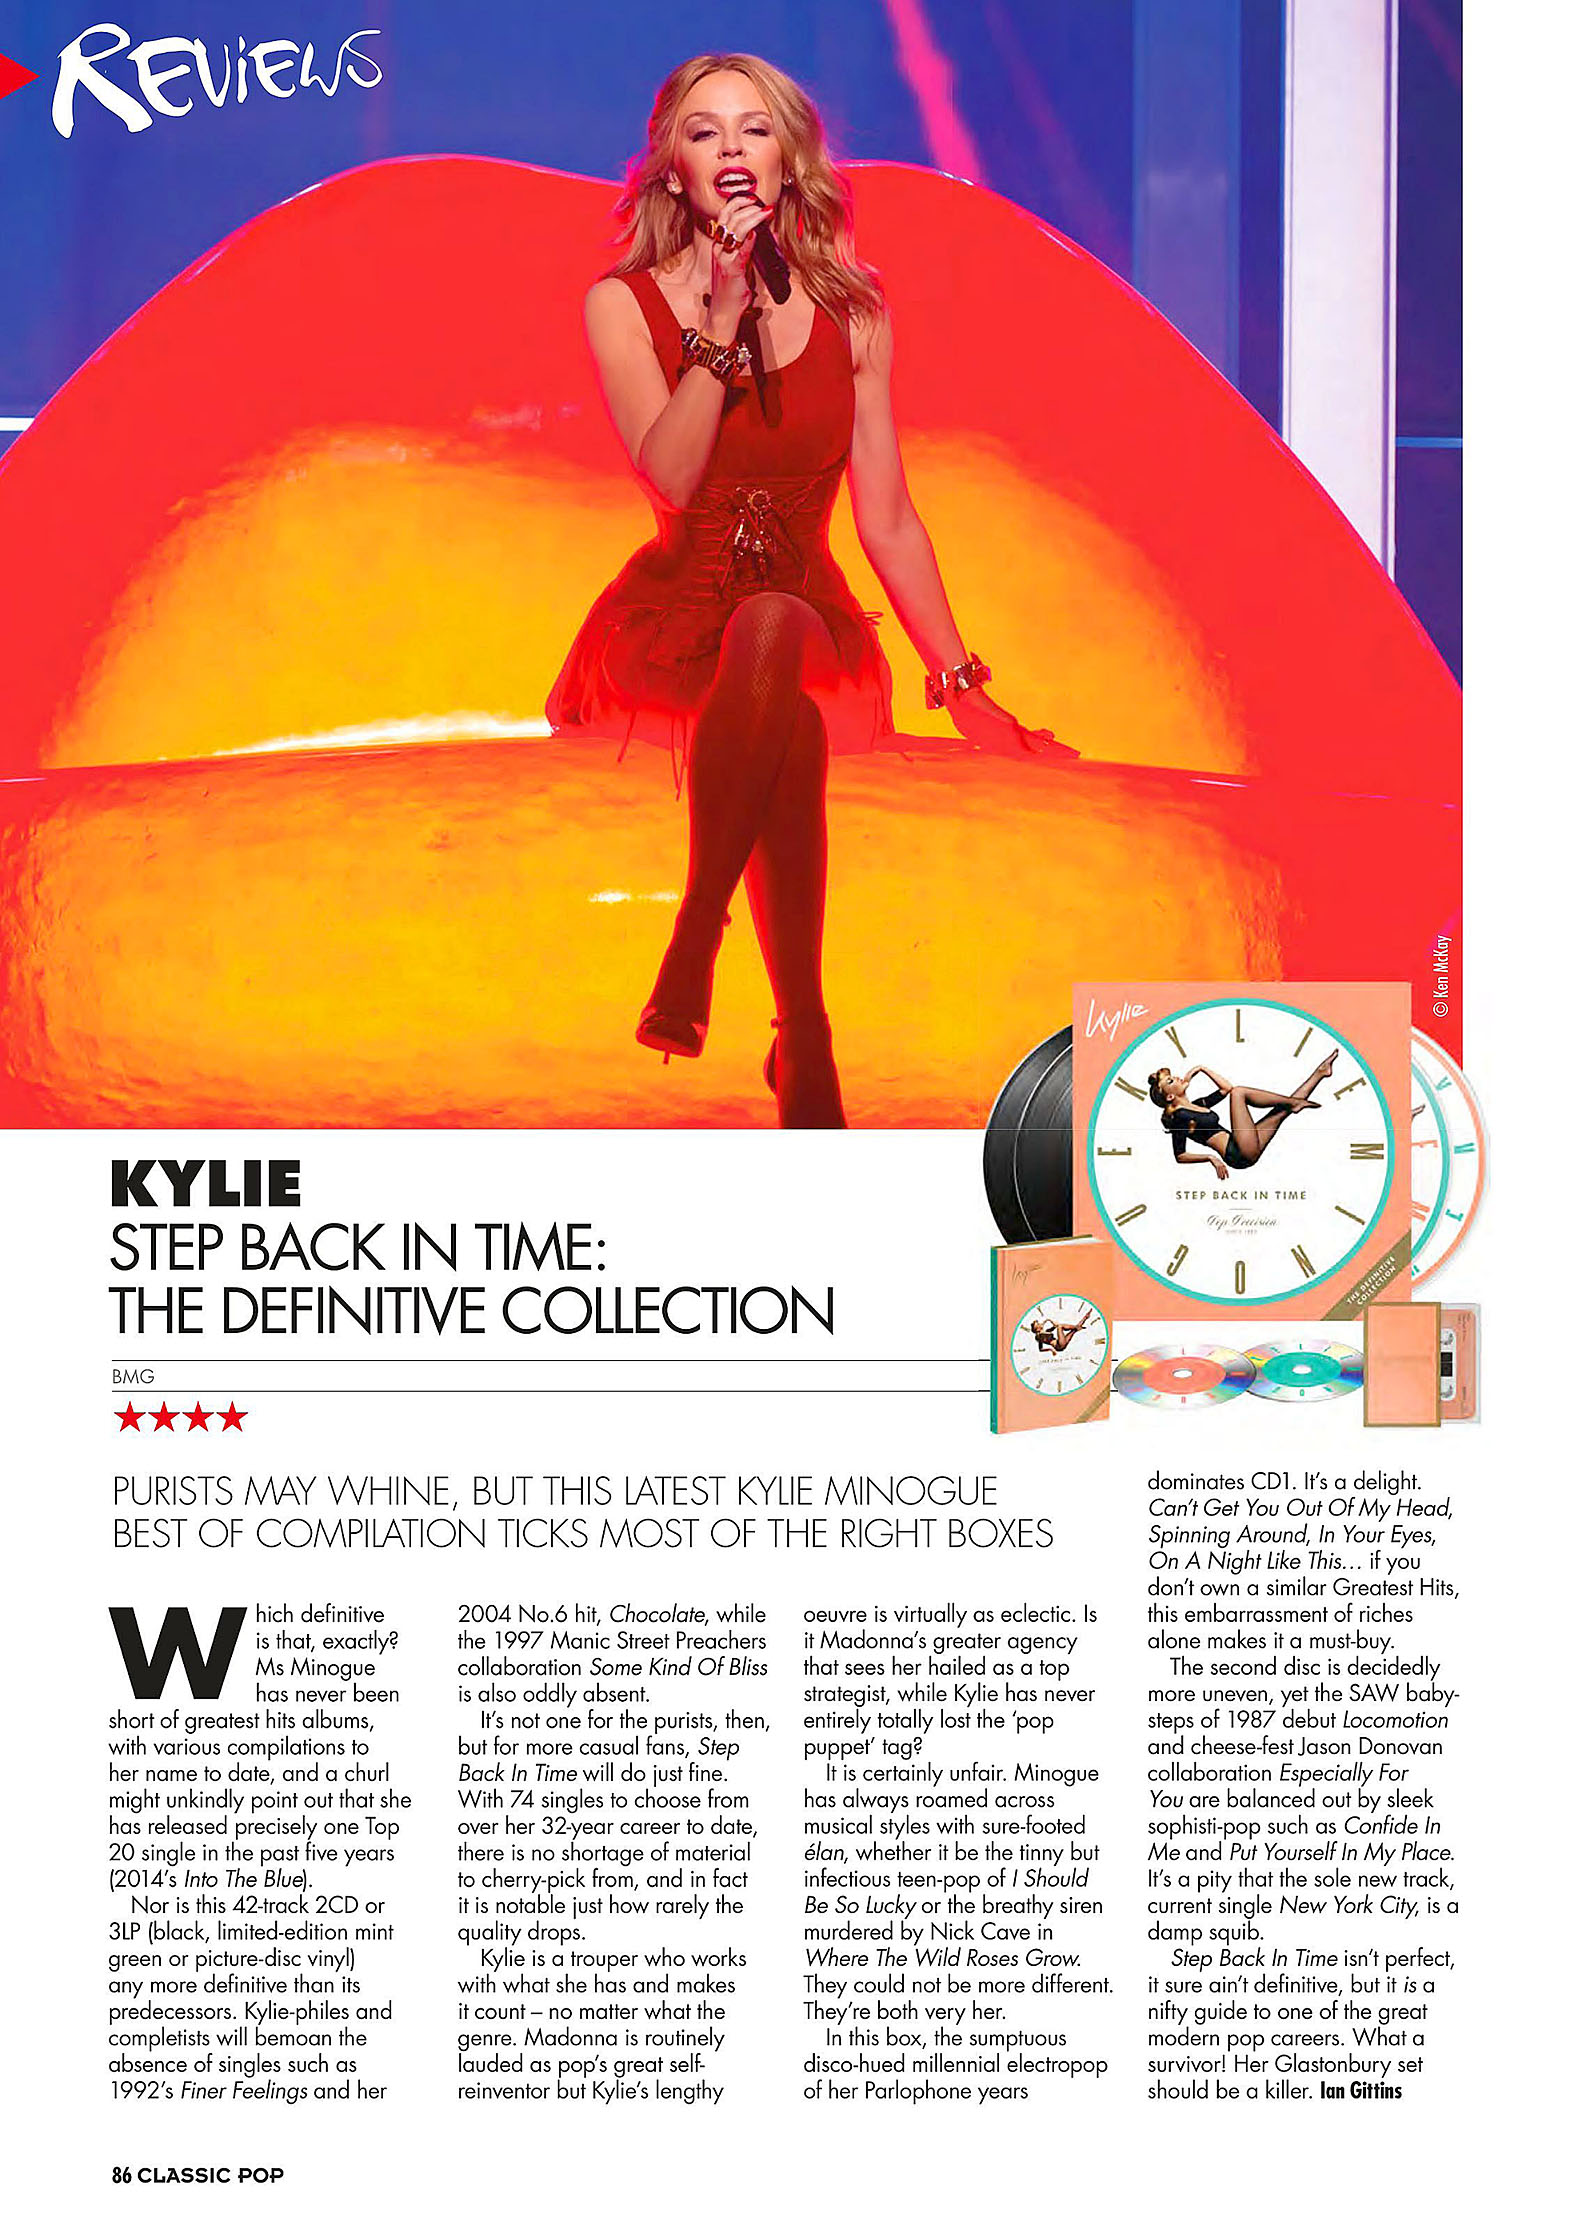 Classic Pop 2019-07 Kylie 02.jpg